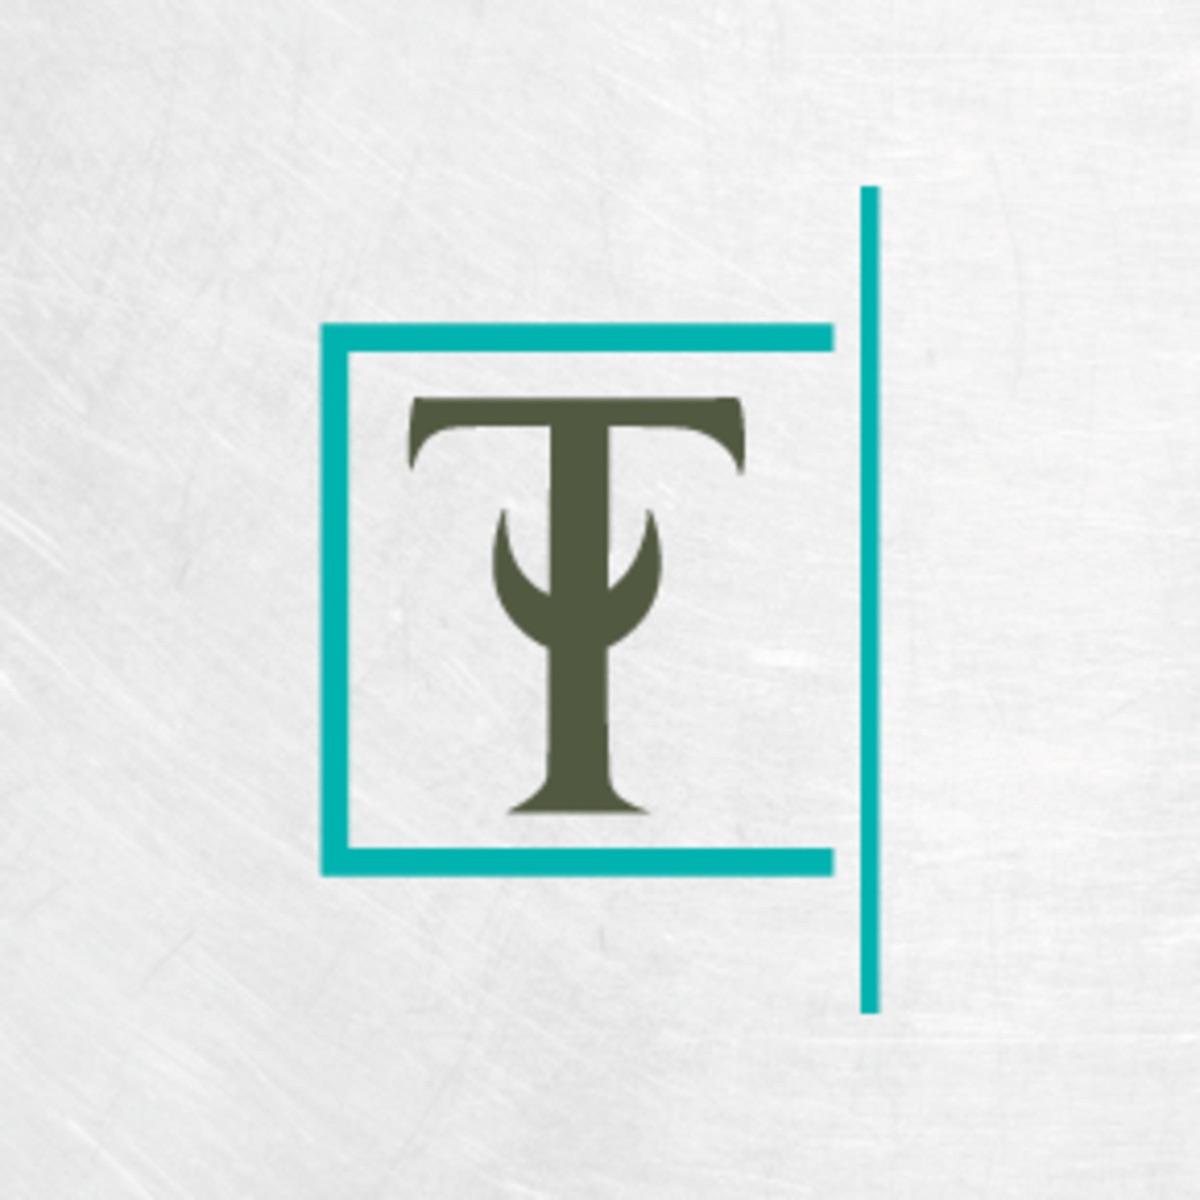 Taarruz - Unutulan Tarih